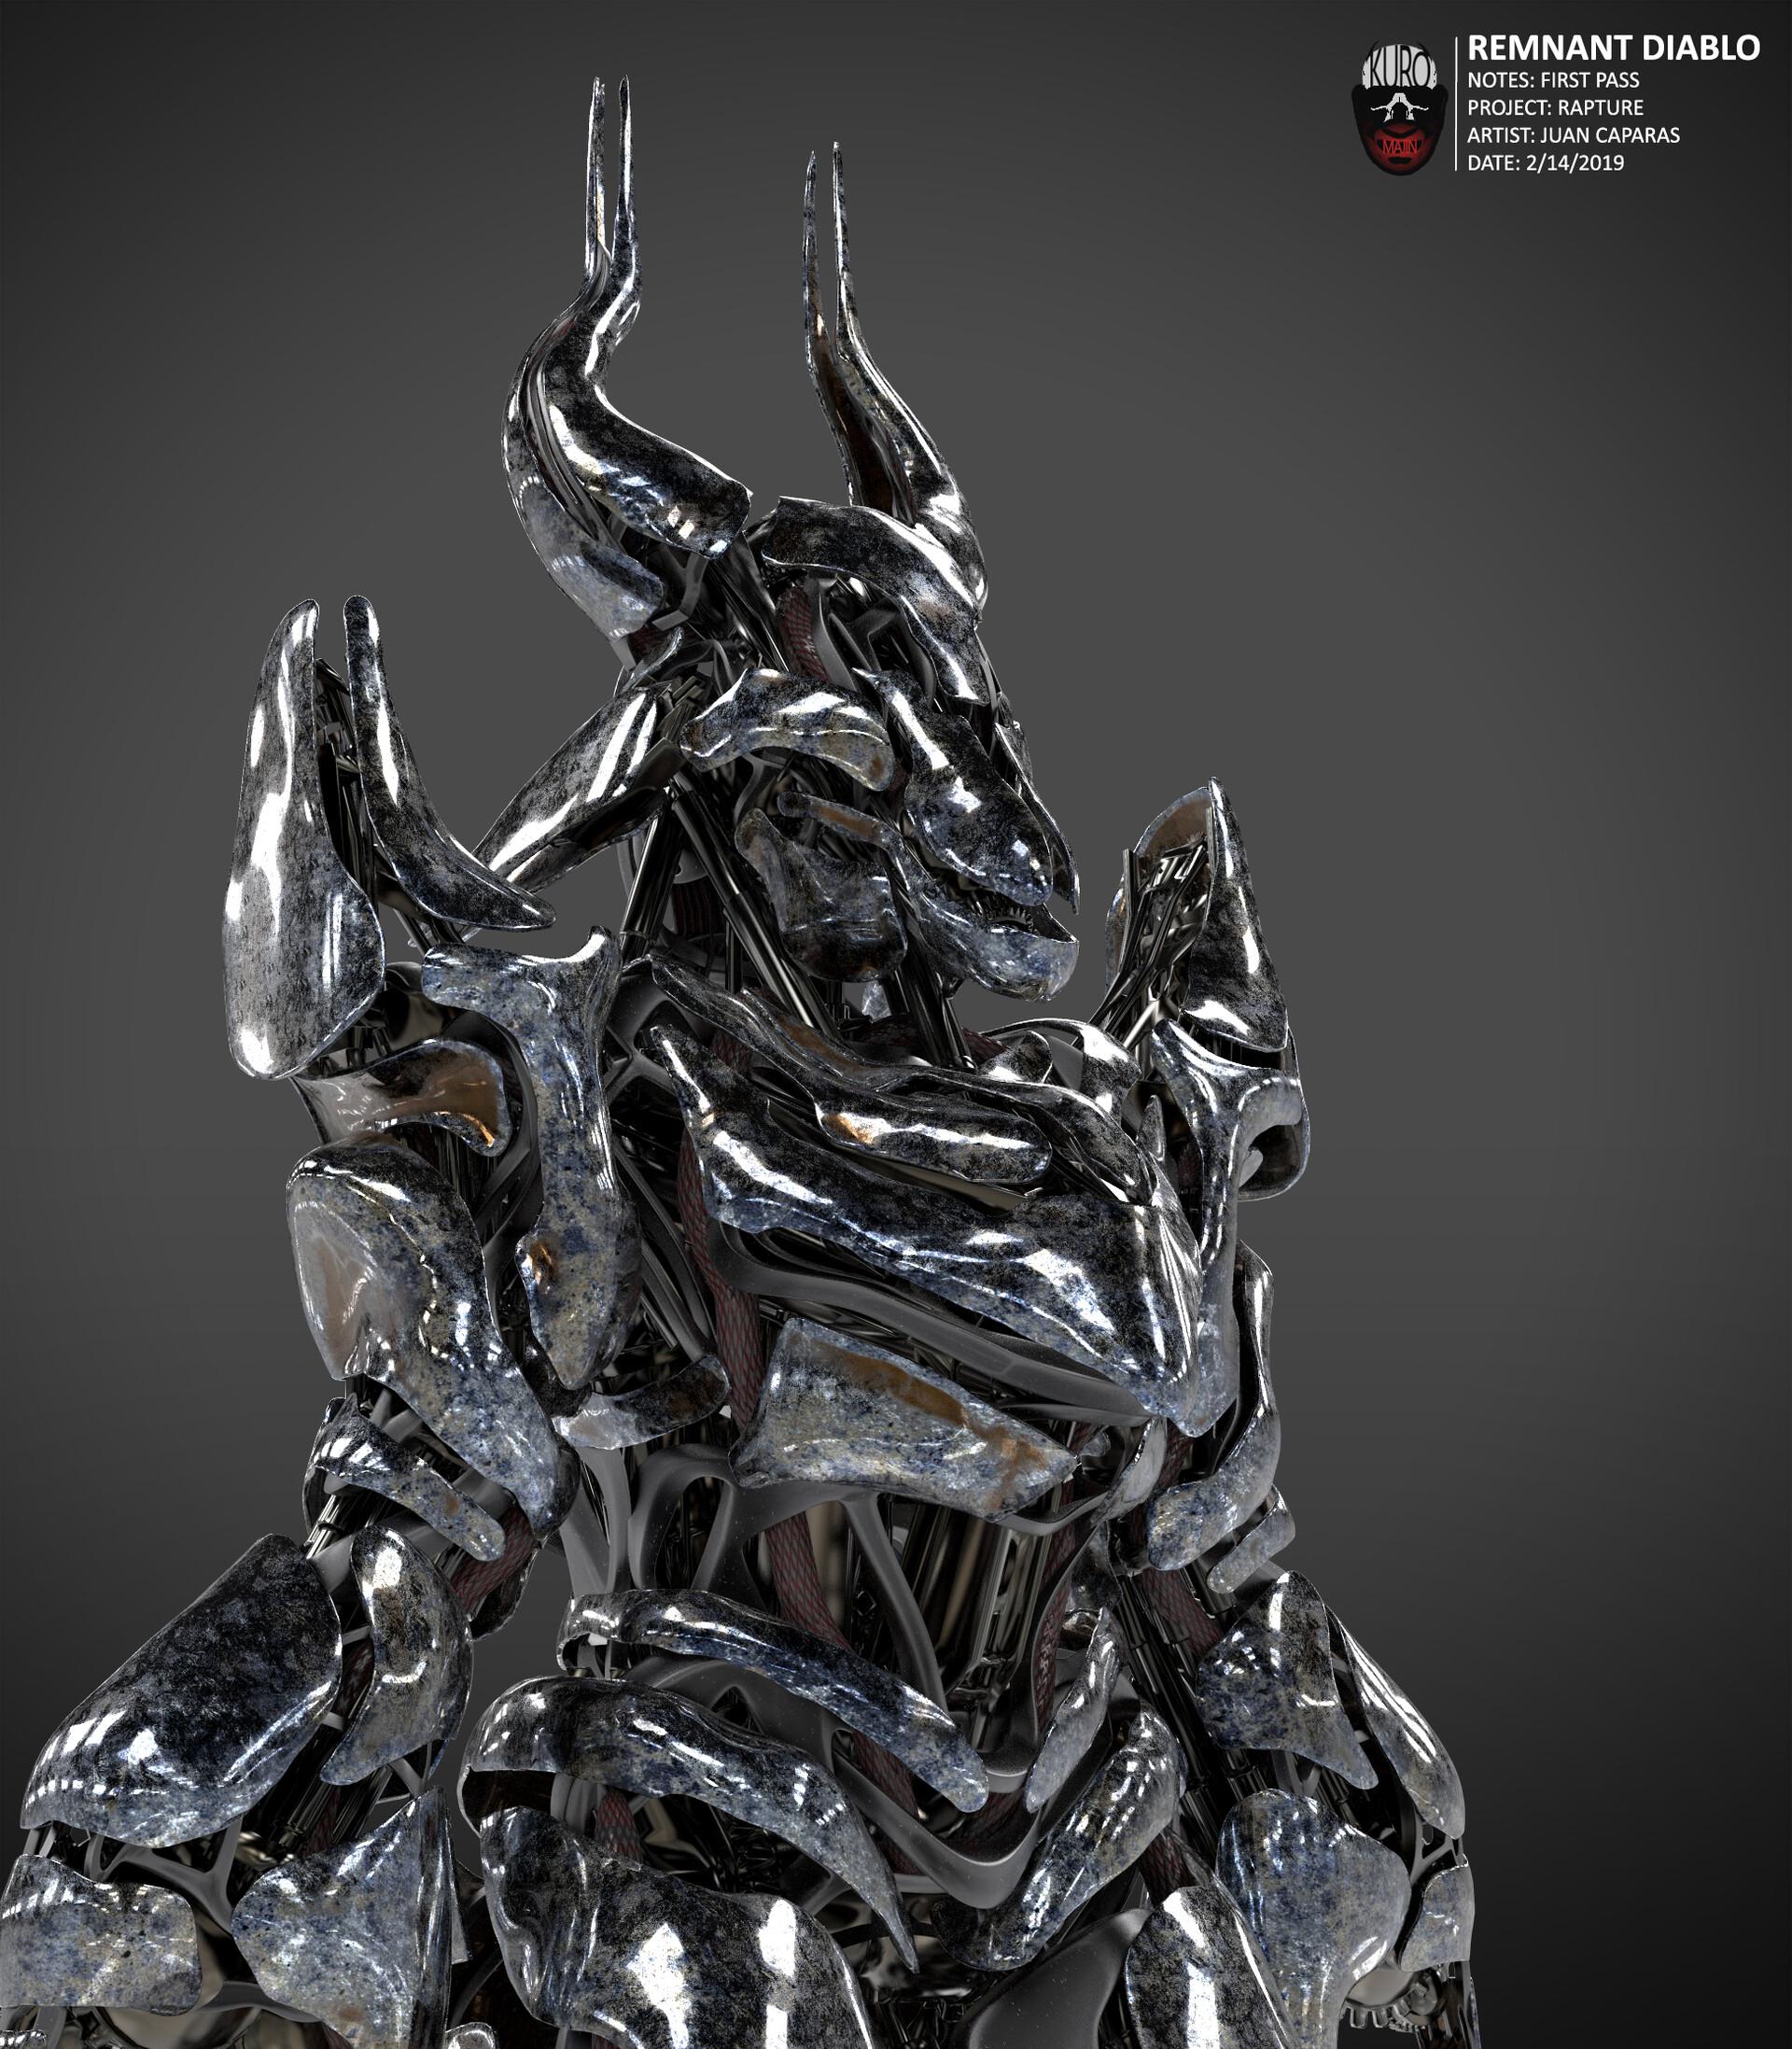 Remnant Diablo Concept   Kuro Majin Productions